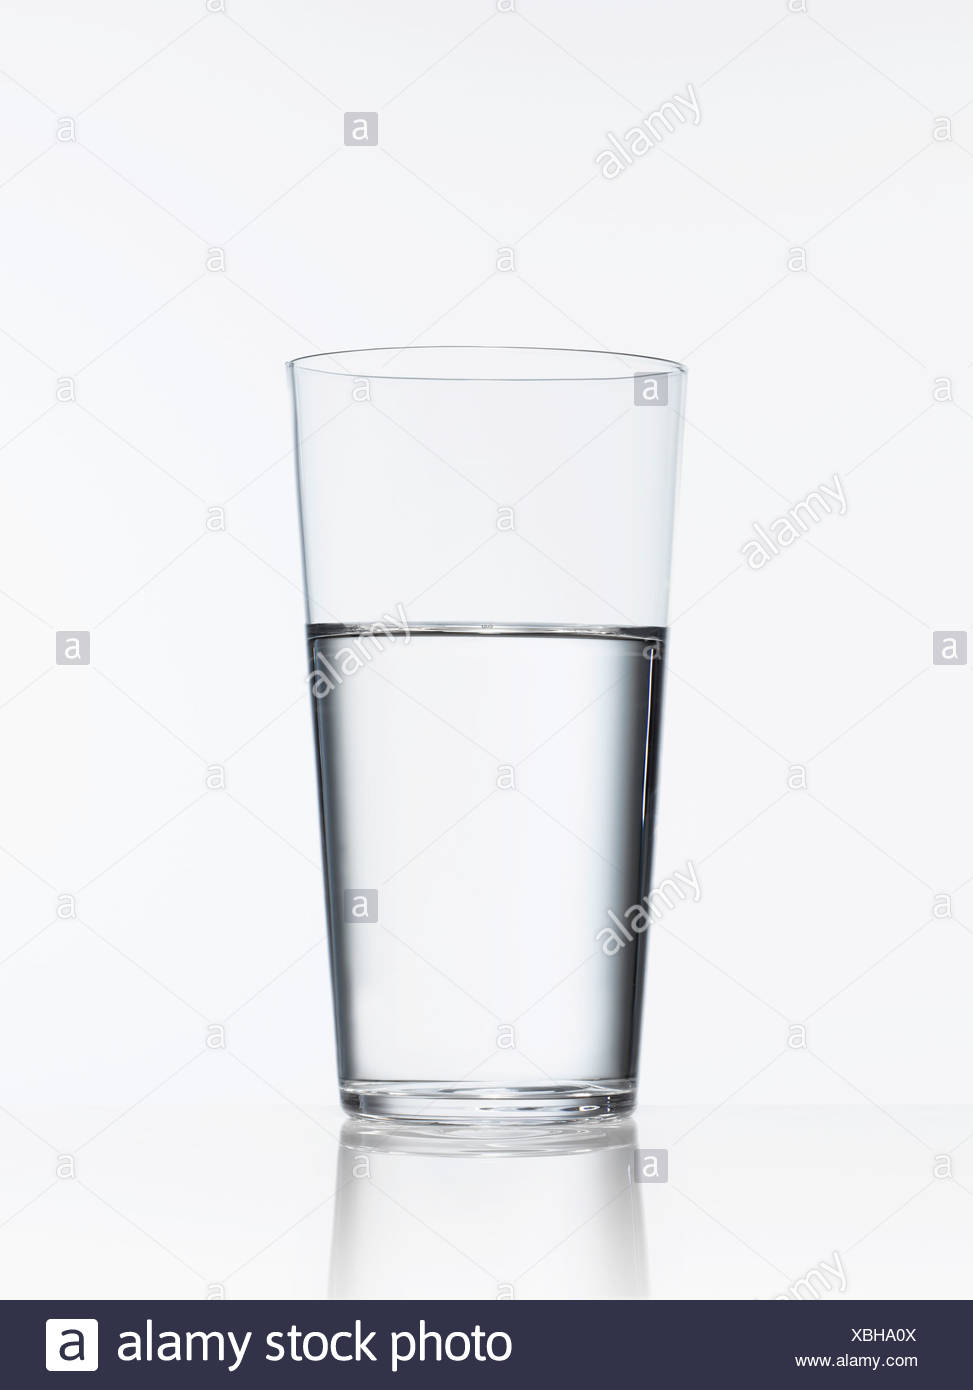 Foto de estudio de vaso de agua Imagen De Stock